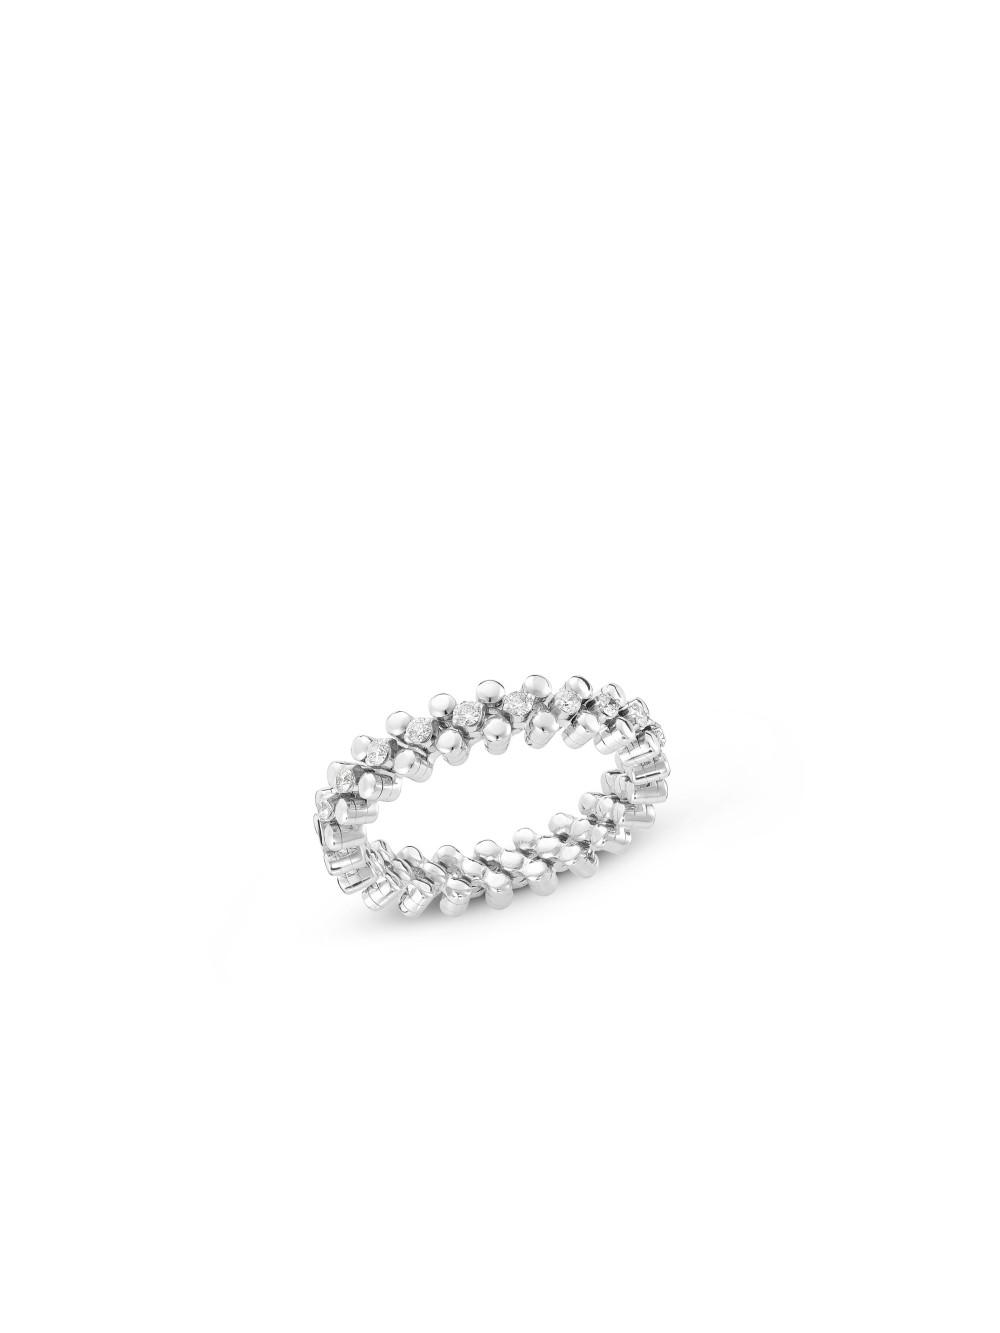 Ring Multisize Serafino Consoli 01